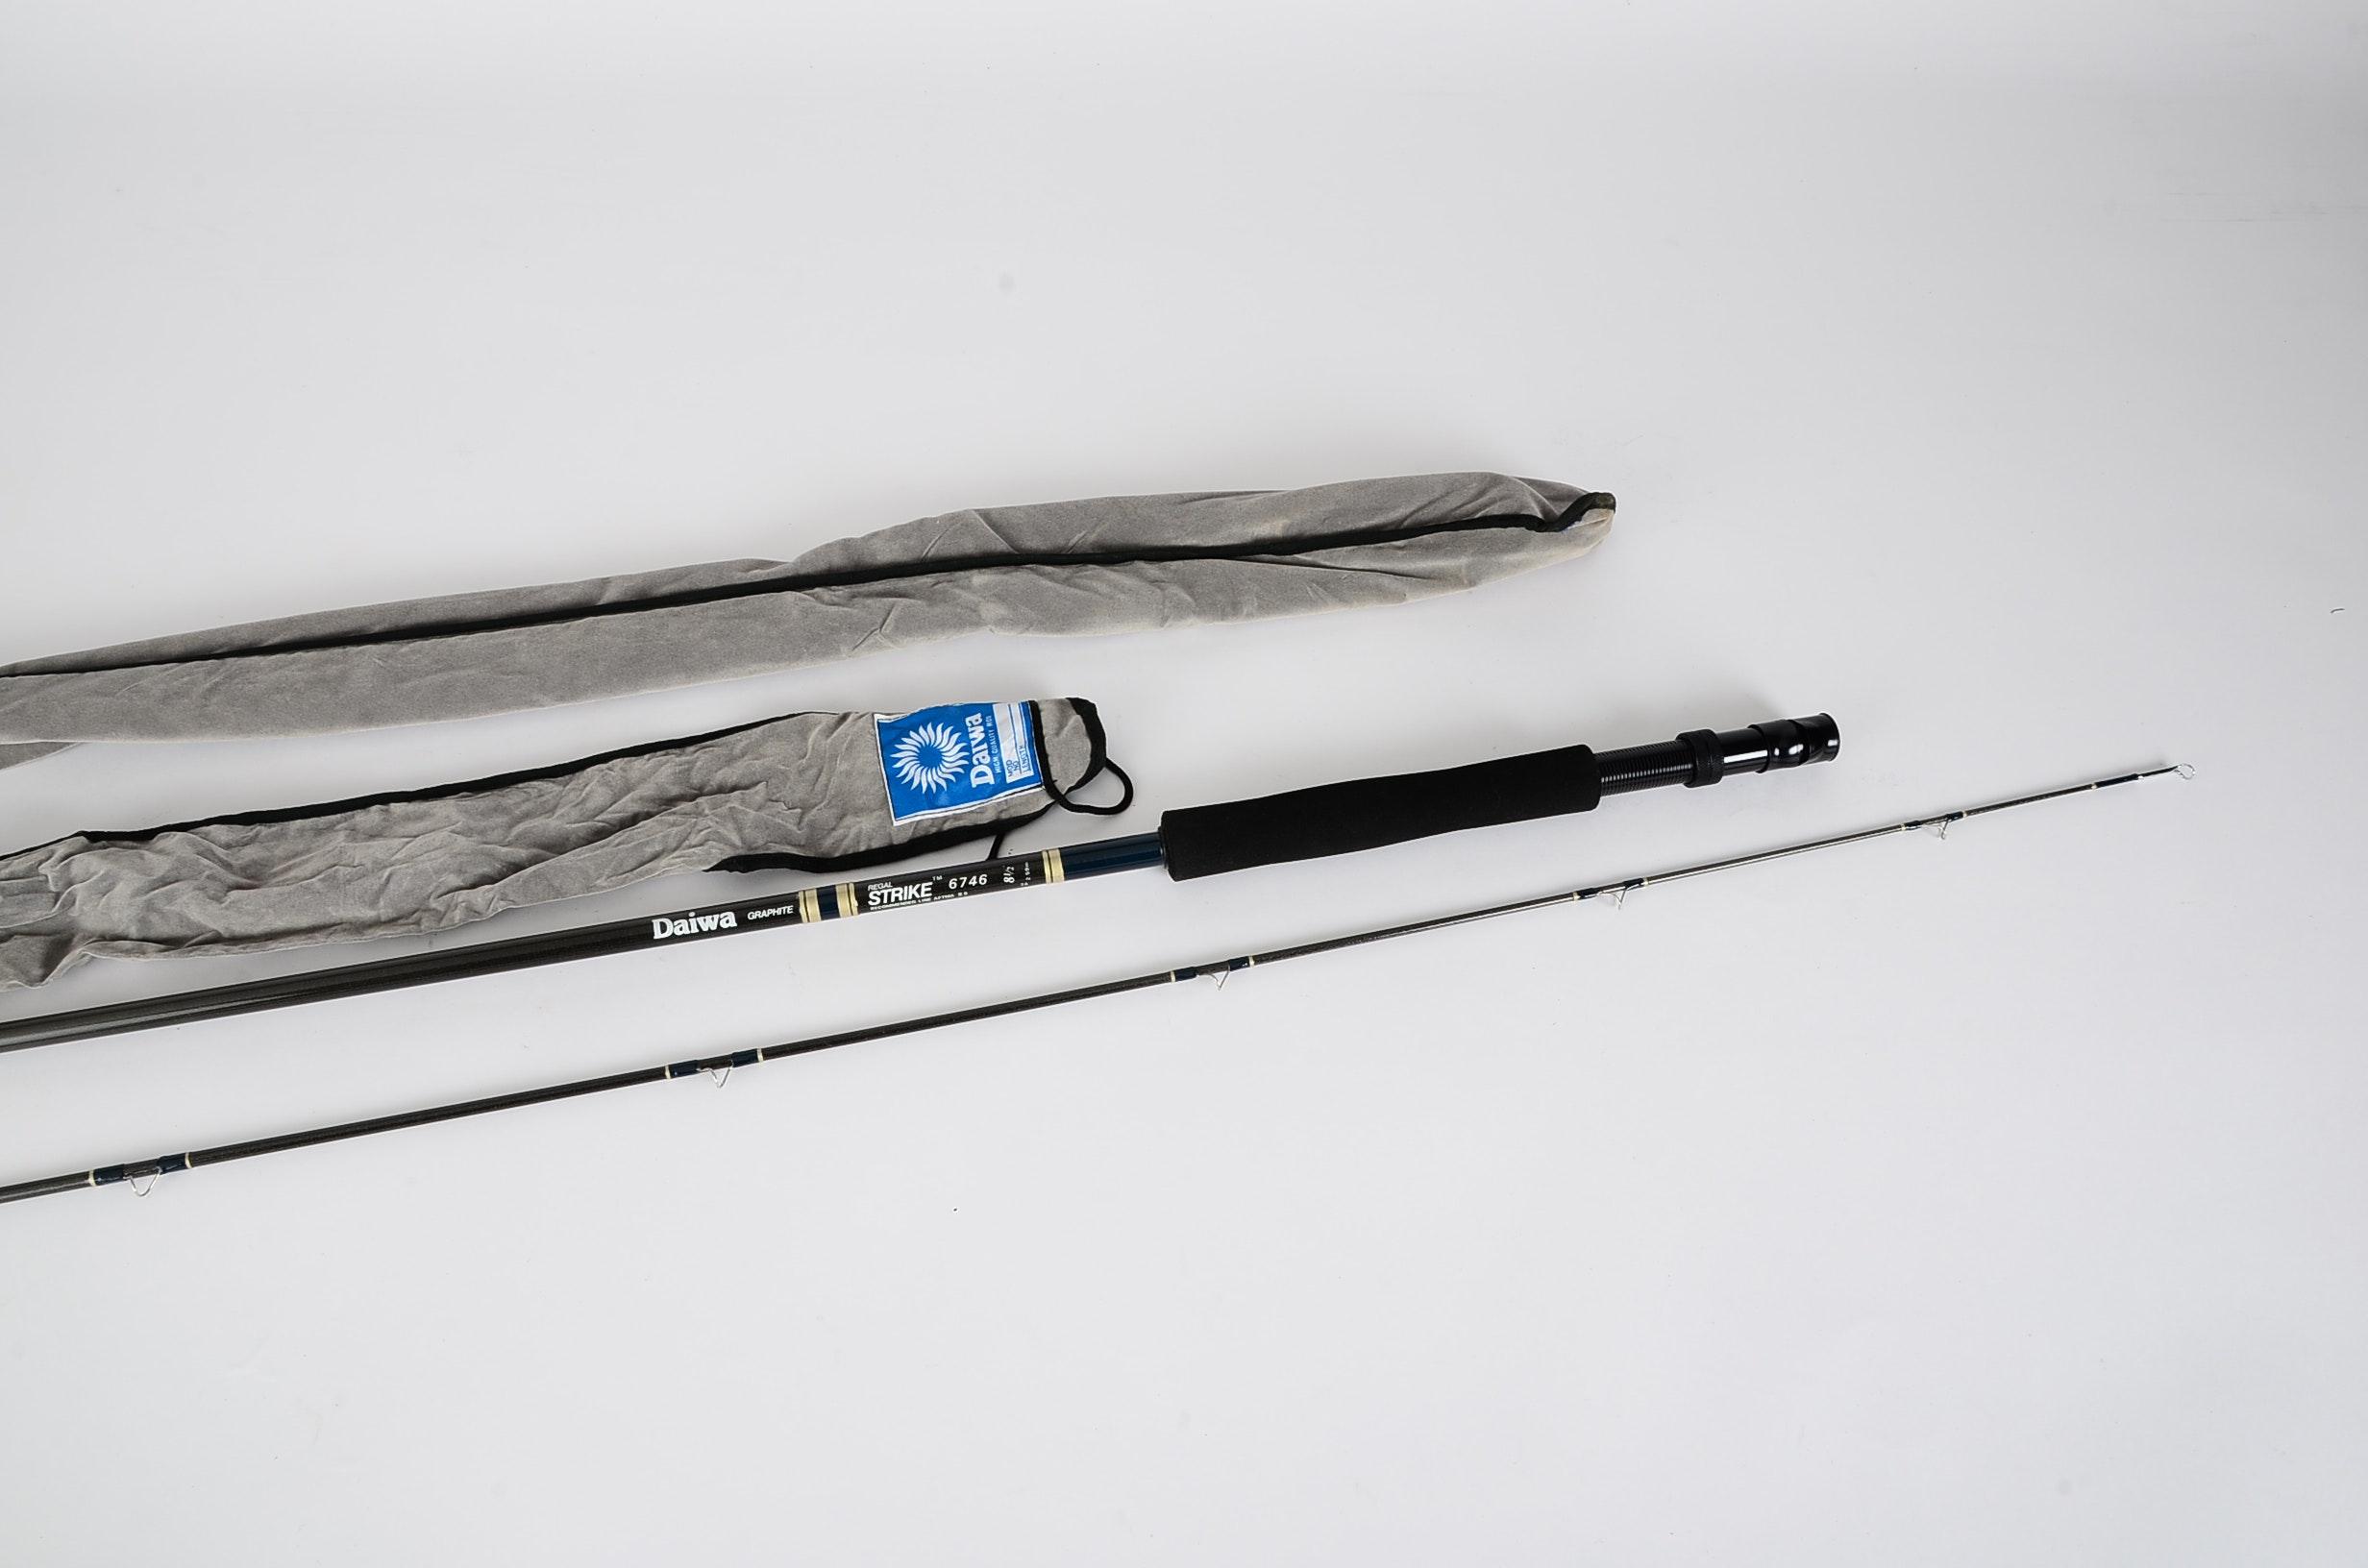 Two Daiwa Graphite Regal Strike Fly Fishing Rods